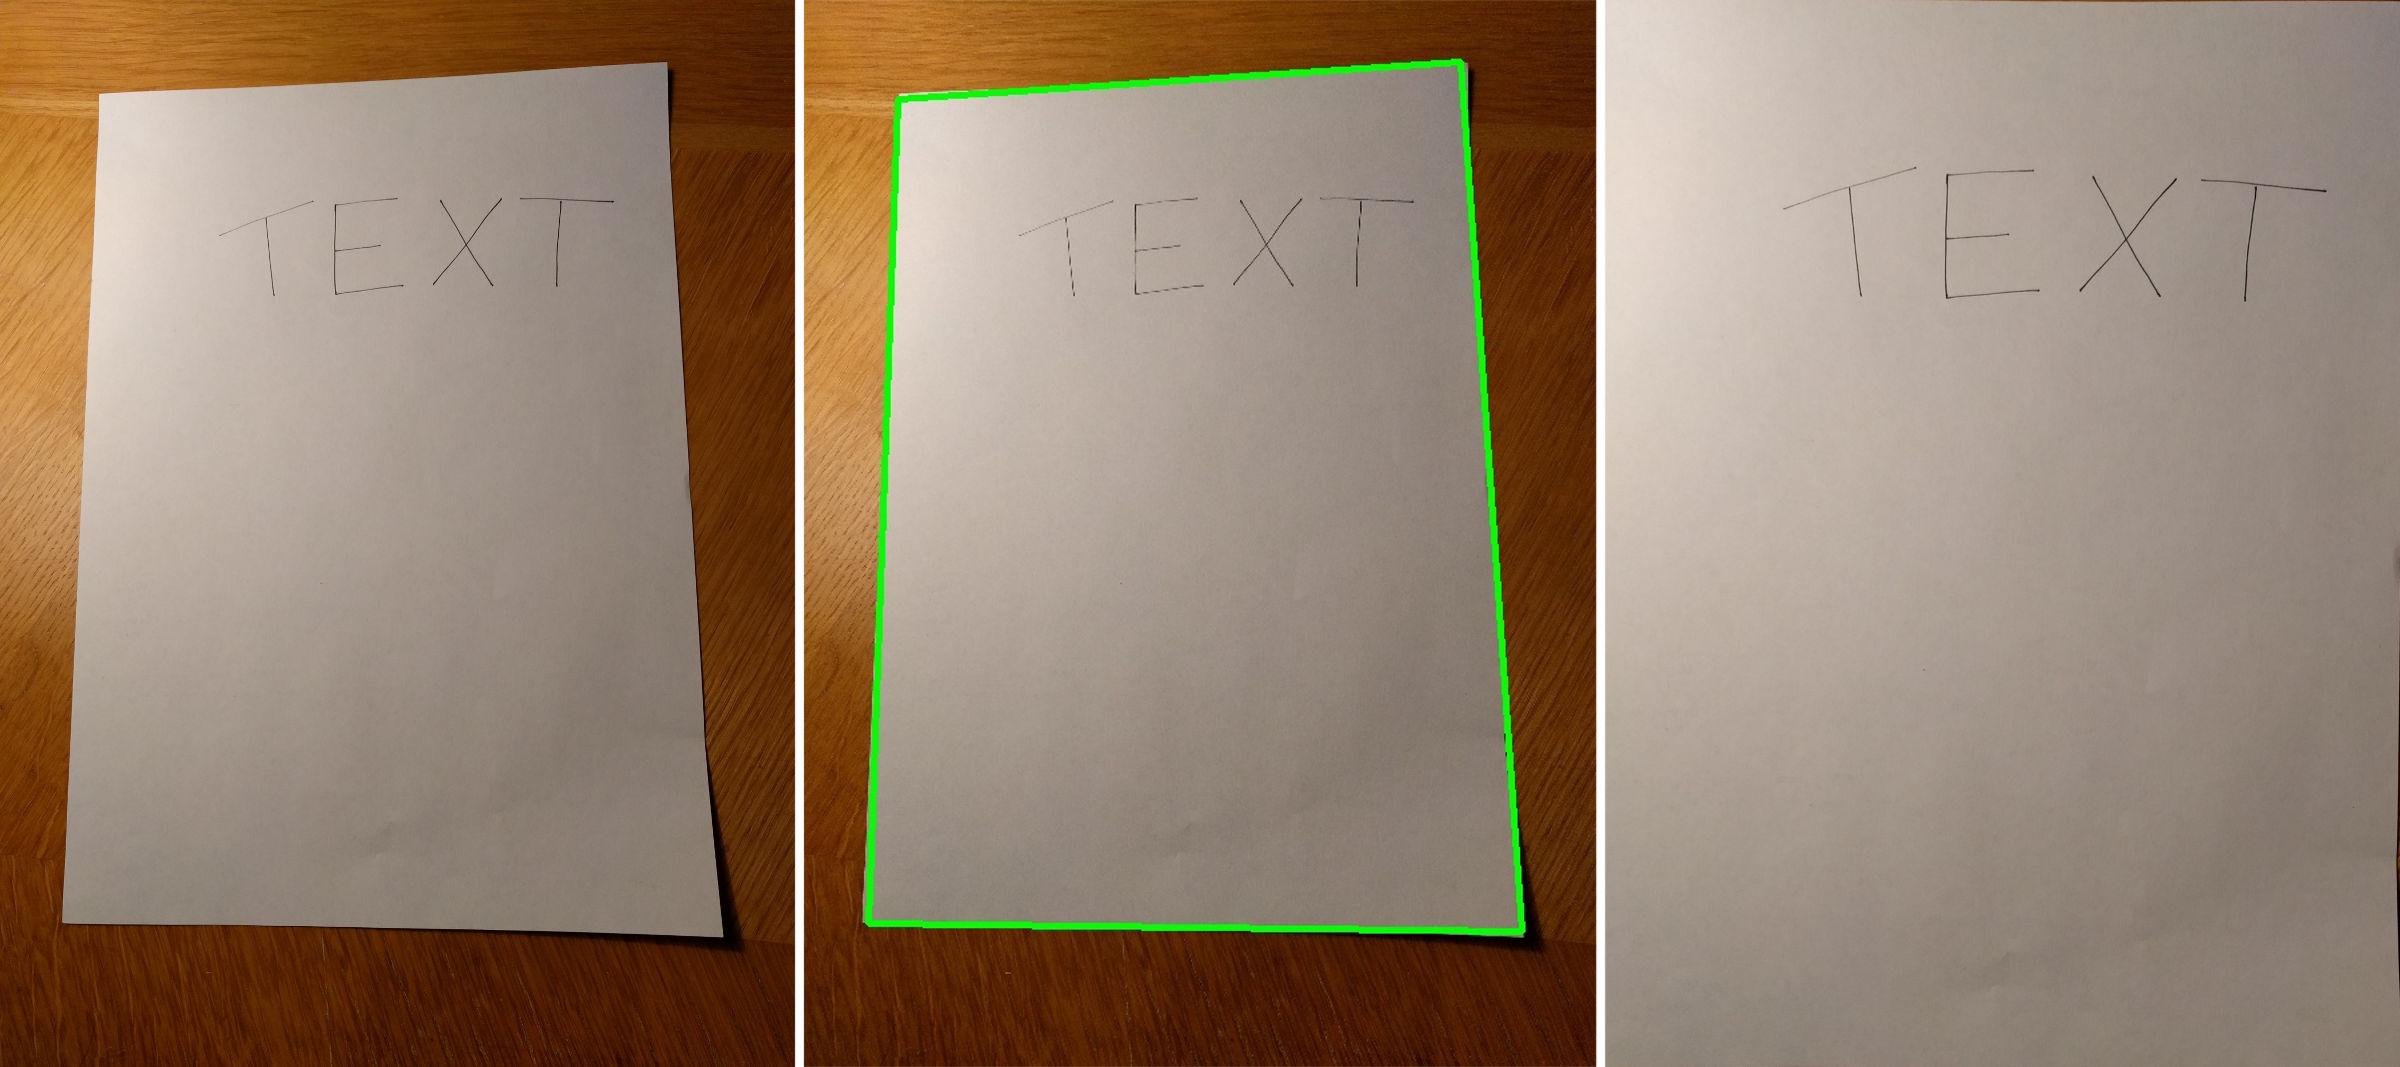 Drawing Lines In Opencv : Scanning documents from photos using opencv breta hajek